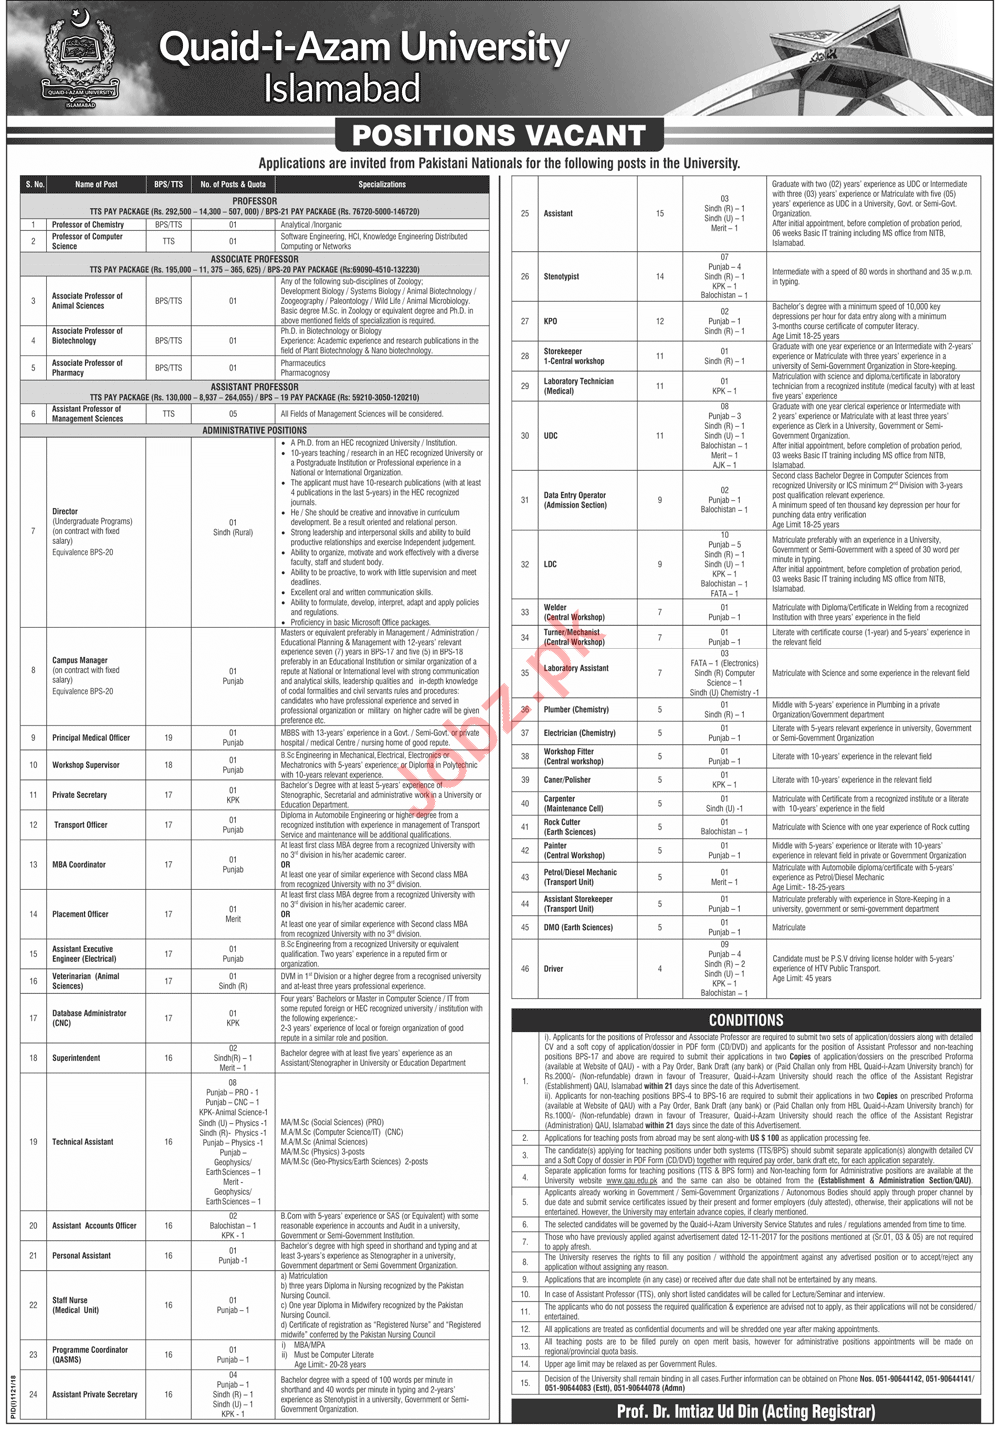 Quaid i Azam University Islamabad Jobs 2018 for Officers